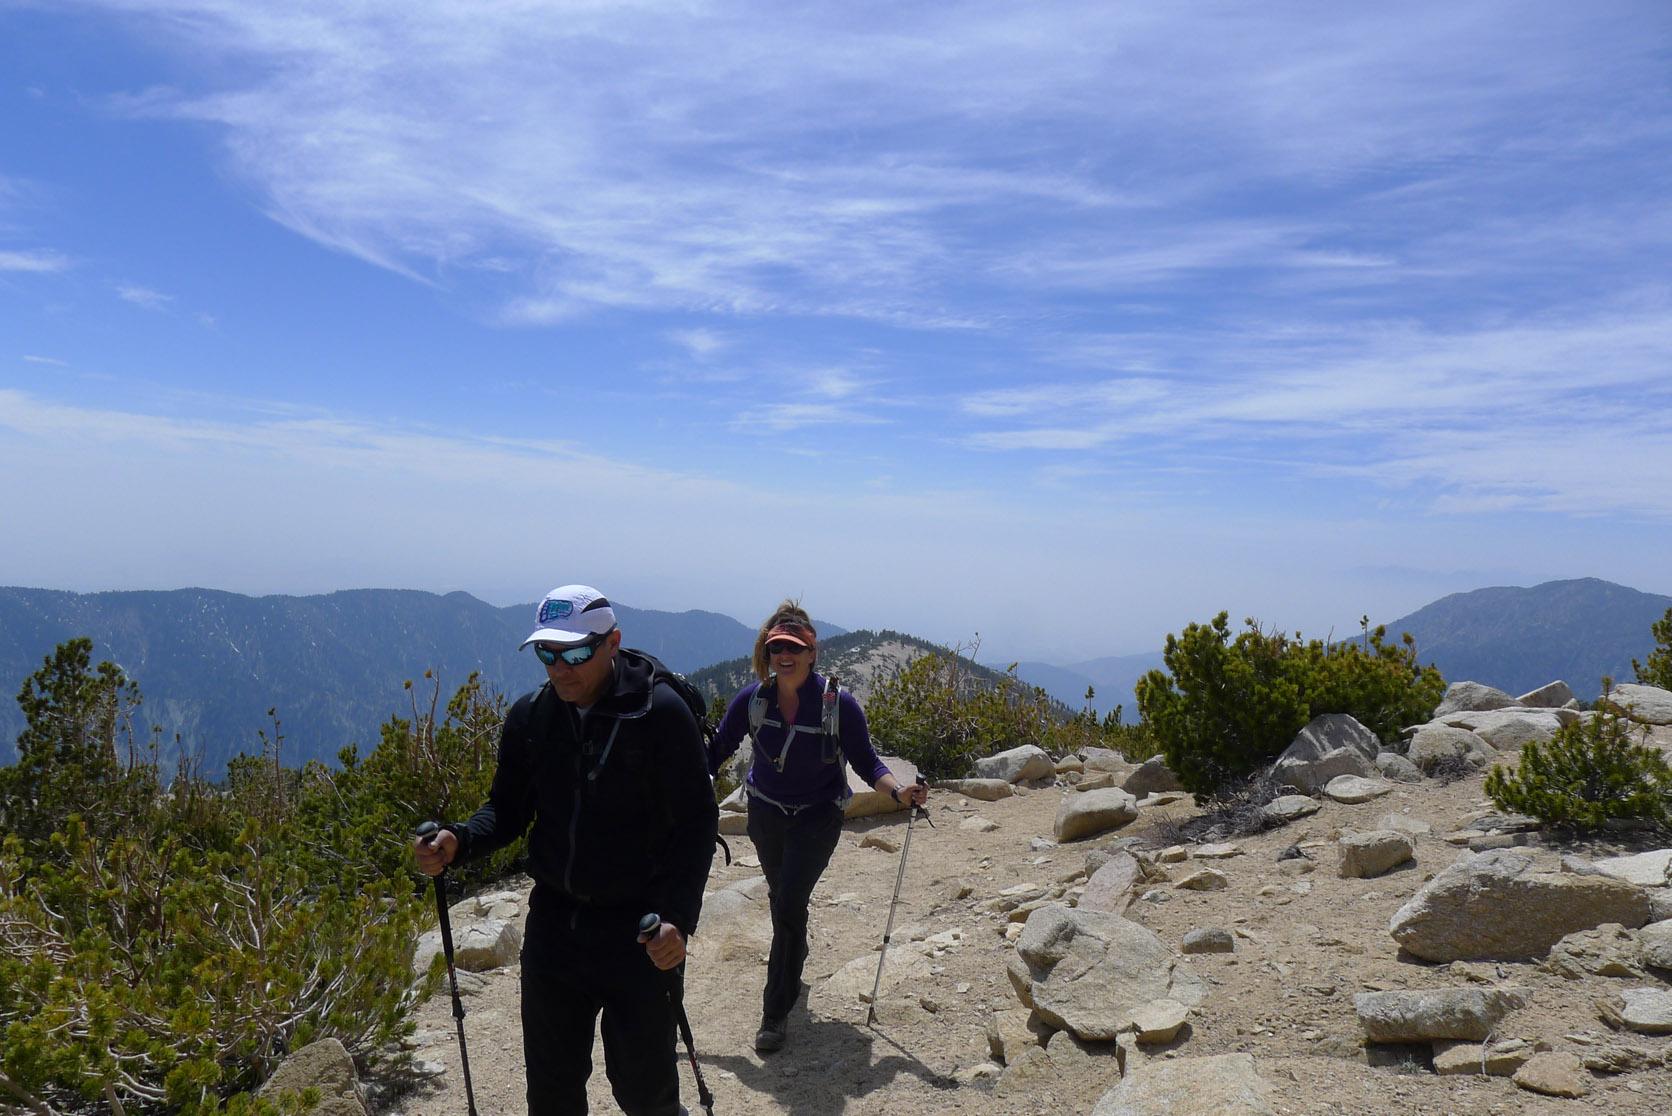 Mt. San Gorgonio, Jepson Pk, Charlton Pk, Little Charlton Pk – Photo Gallery